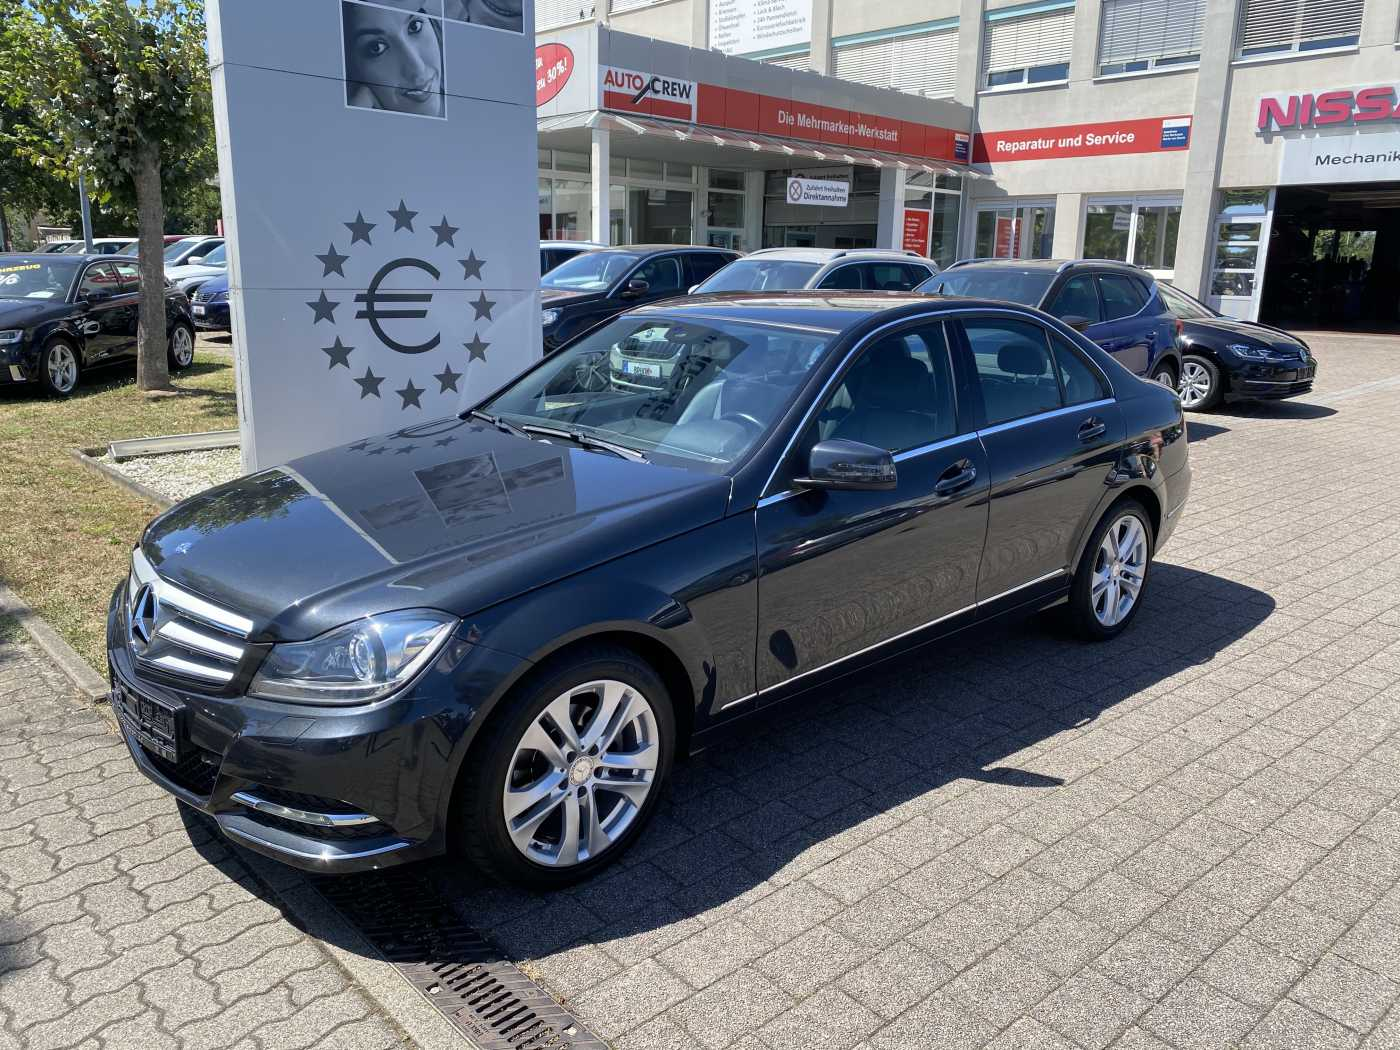 Mercedes-Benz C 220 CDI DPF Avantgarde*Xenon/Comand/PDC/SHZ*, Jahr 2013, Diesel